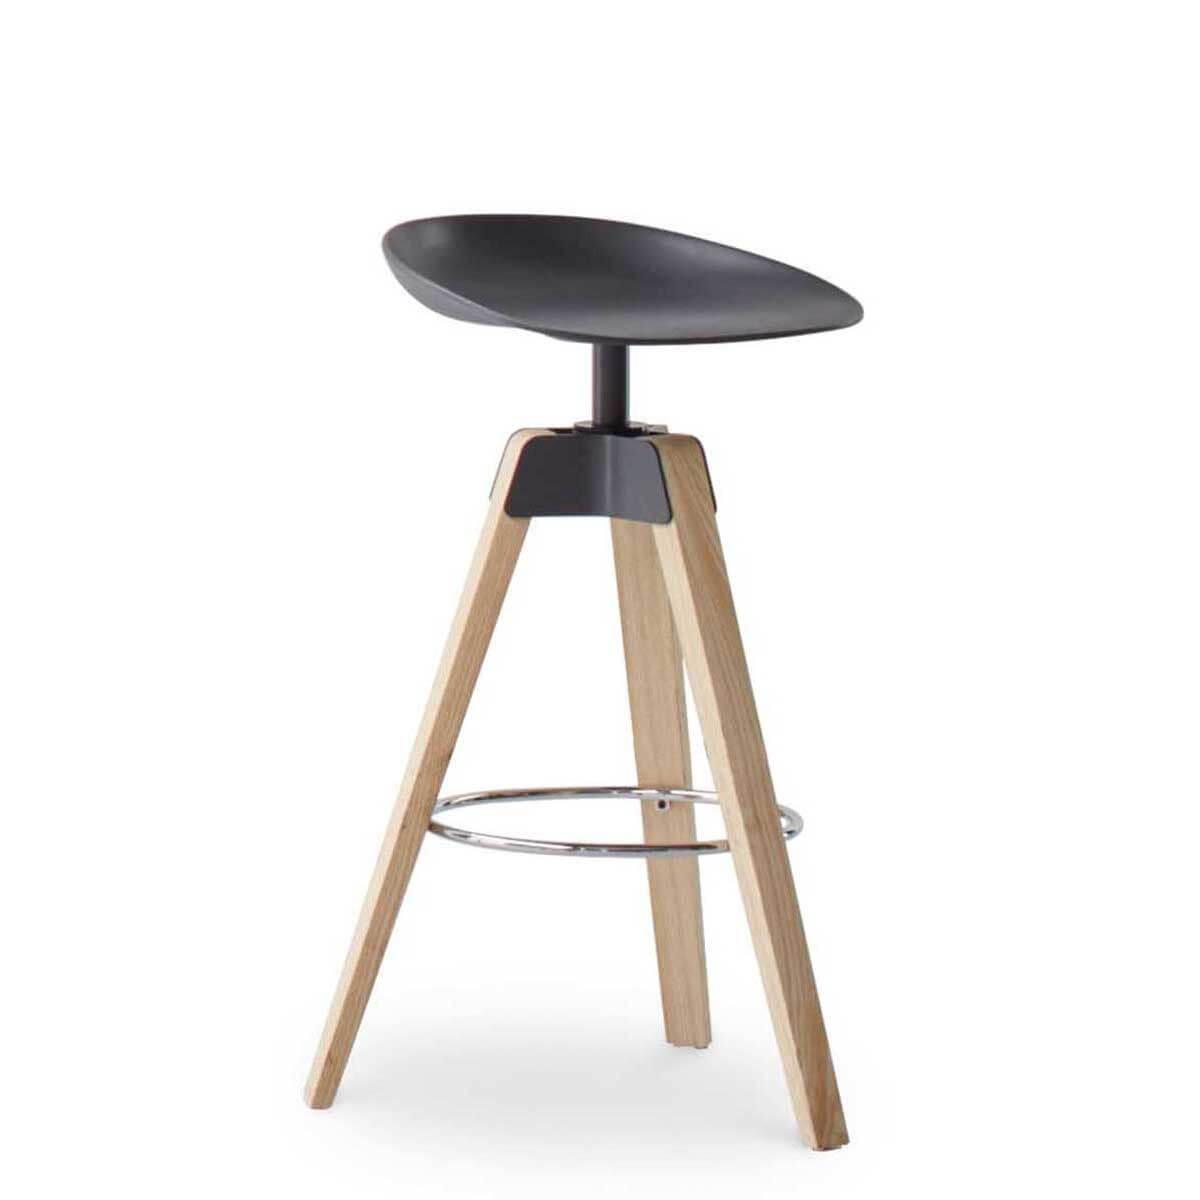 Бар стол Plumage 66 от Bonaldo, Италия